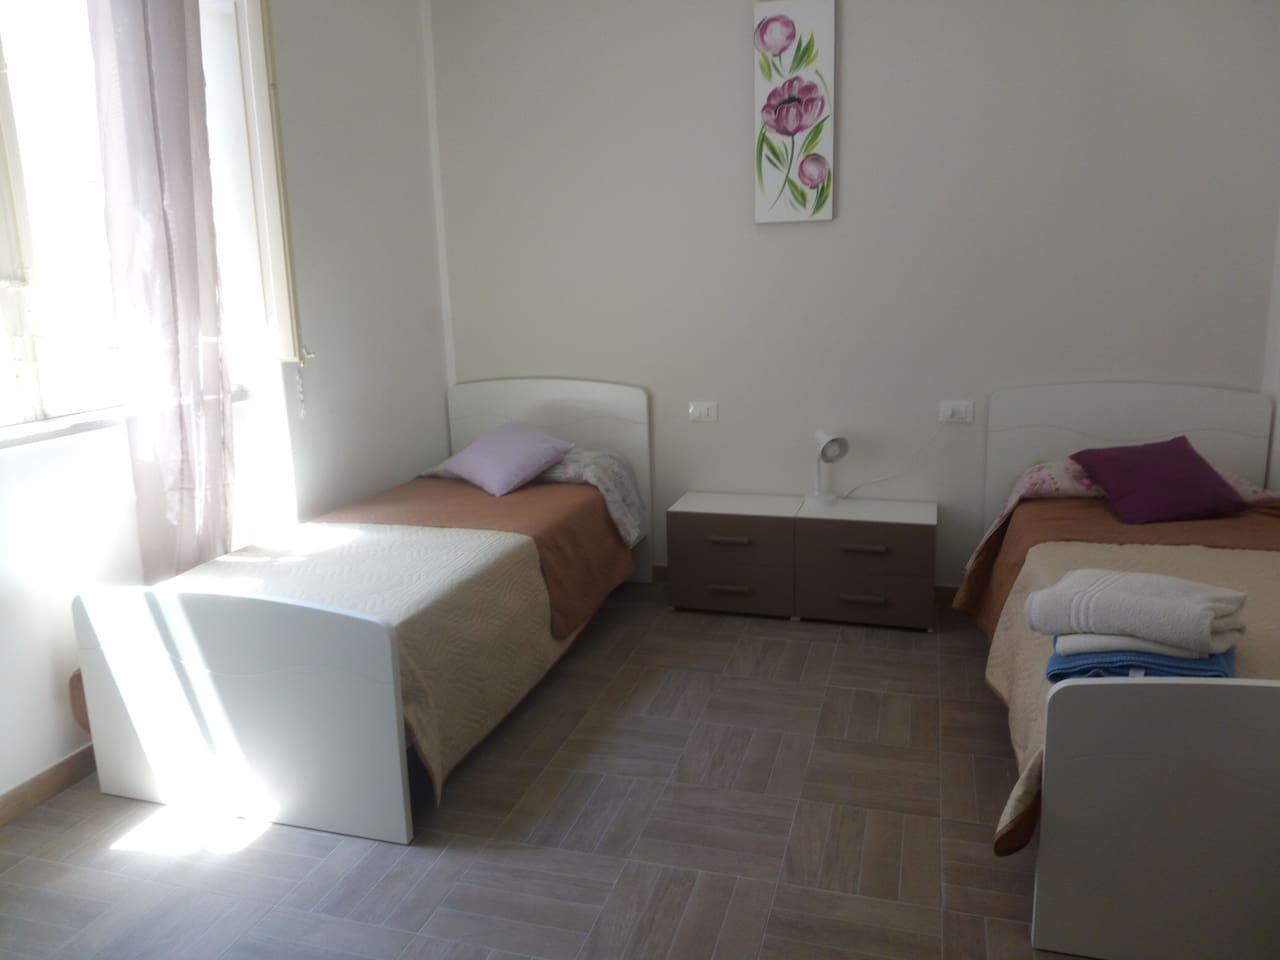 Stanza Iole e Elda - Iole and Elda Room